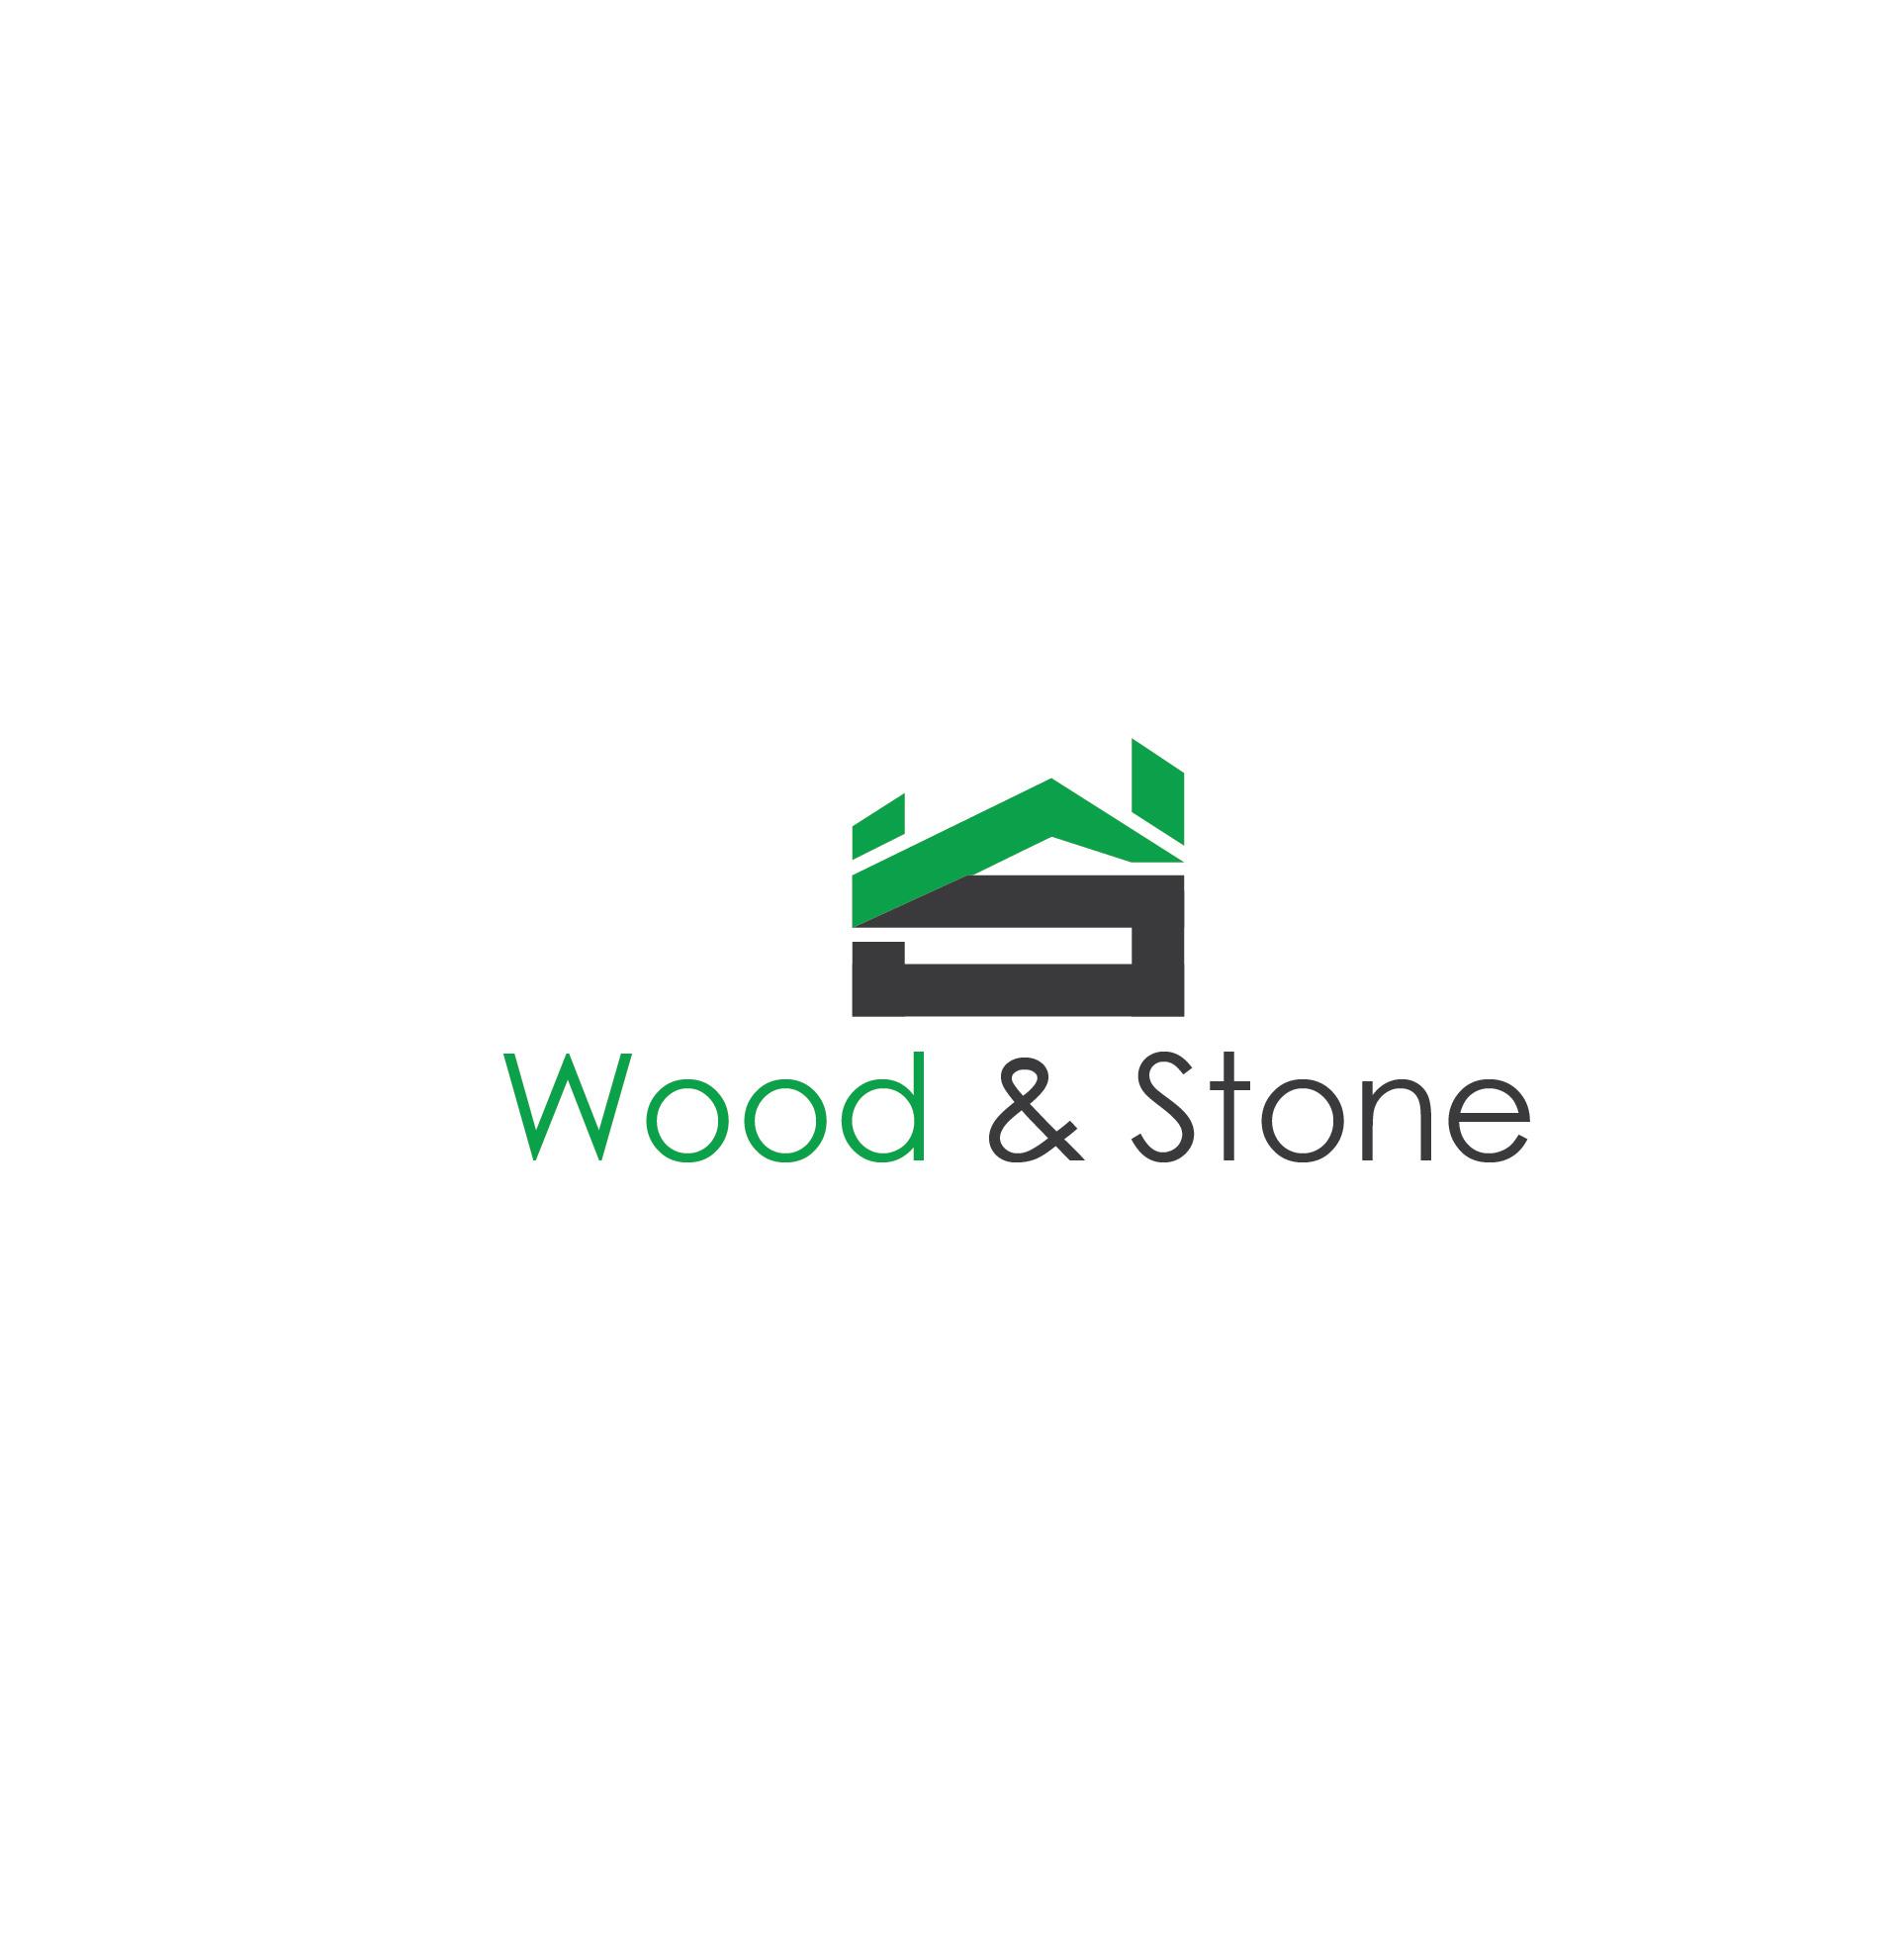 Логотип и Фирменный стиль фото f_608549d38dac3a61.jpg